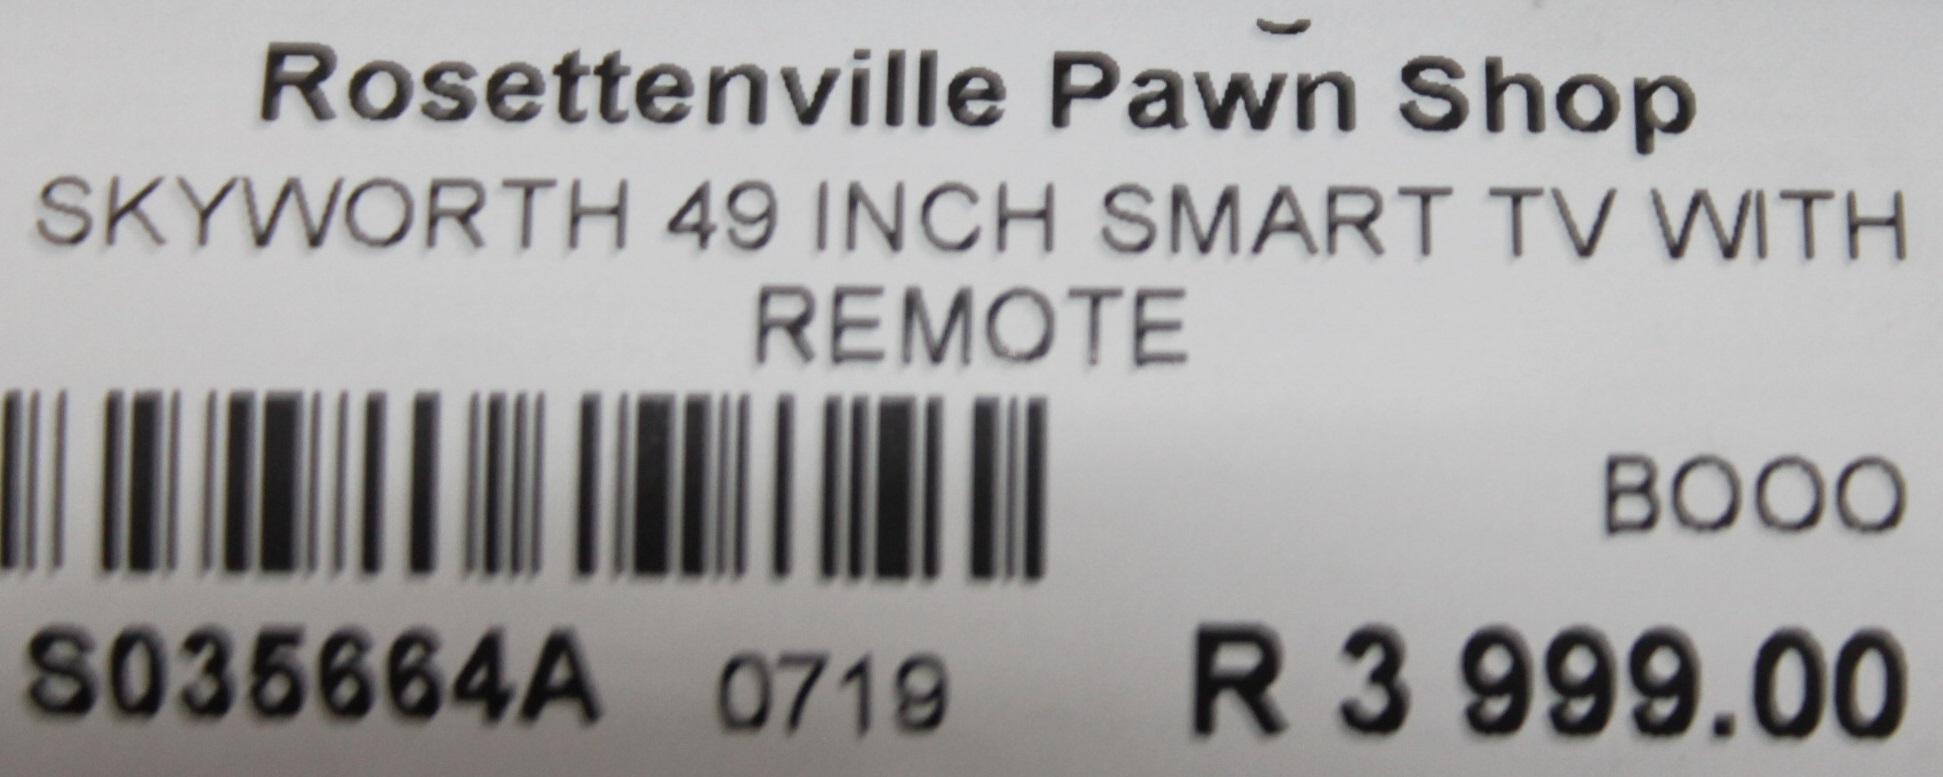 S035664A Skyworth 49 inch smart tv with remote #Rosettenvillepawnshop